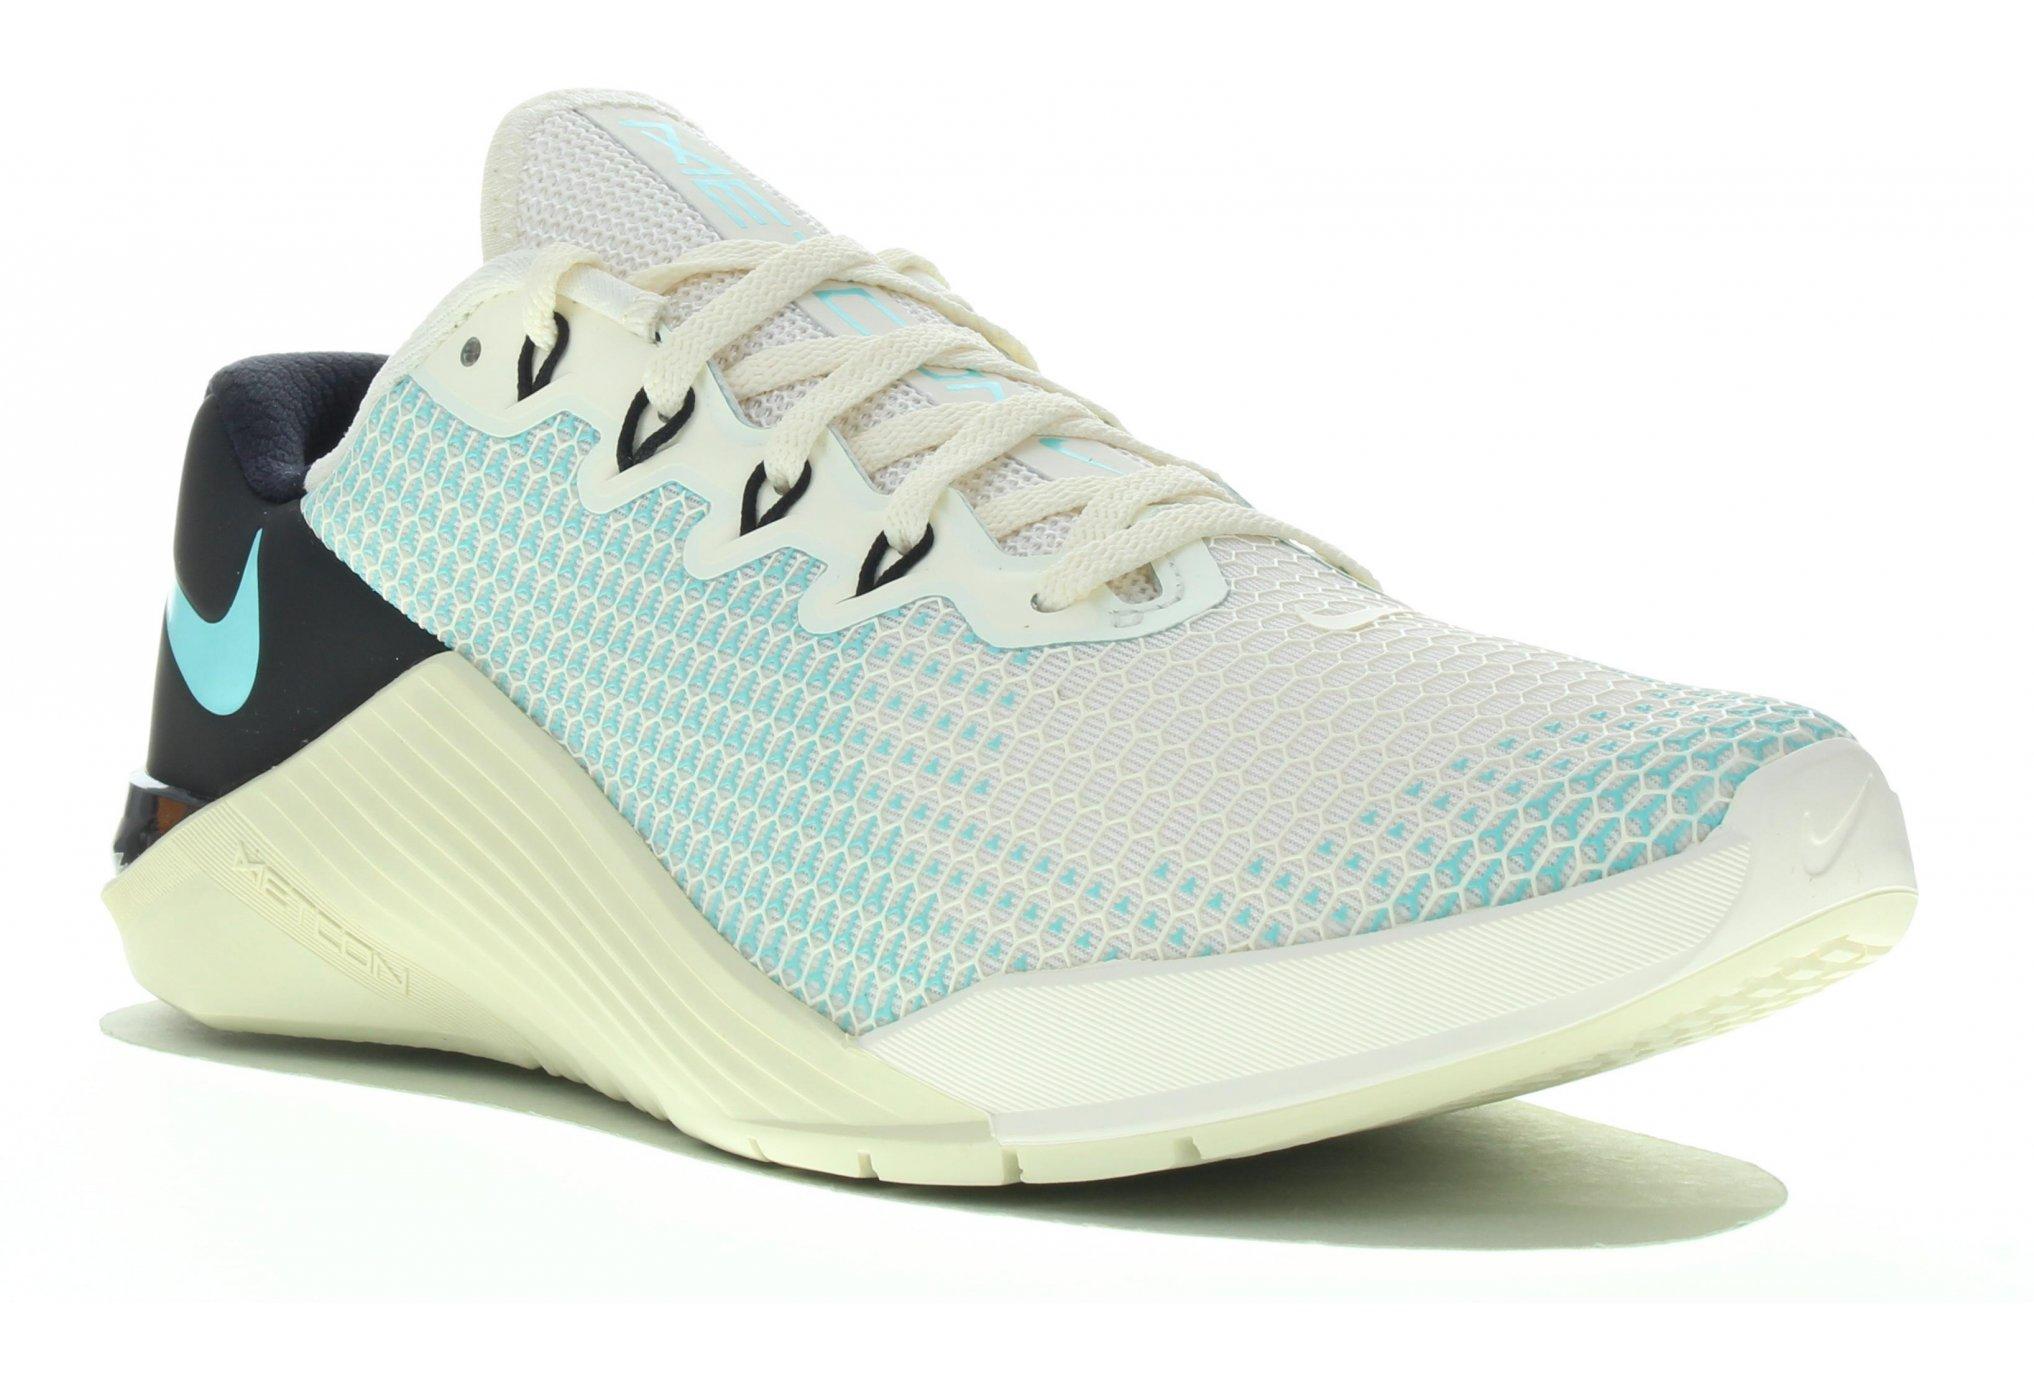 Nike Metcon 5 W Chaussures running femme